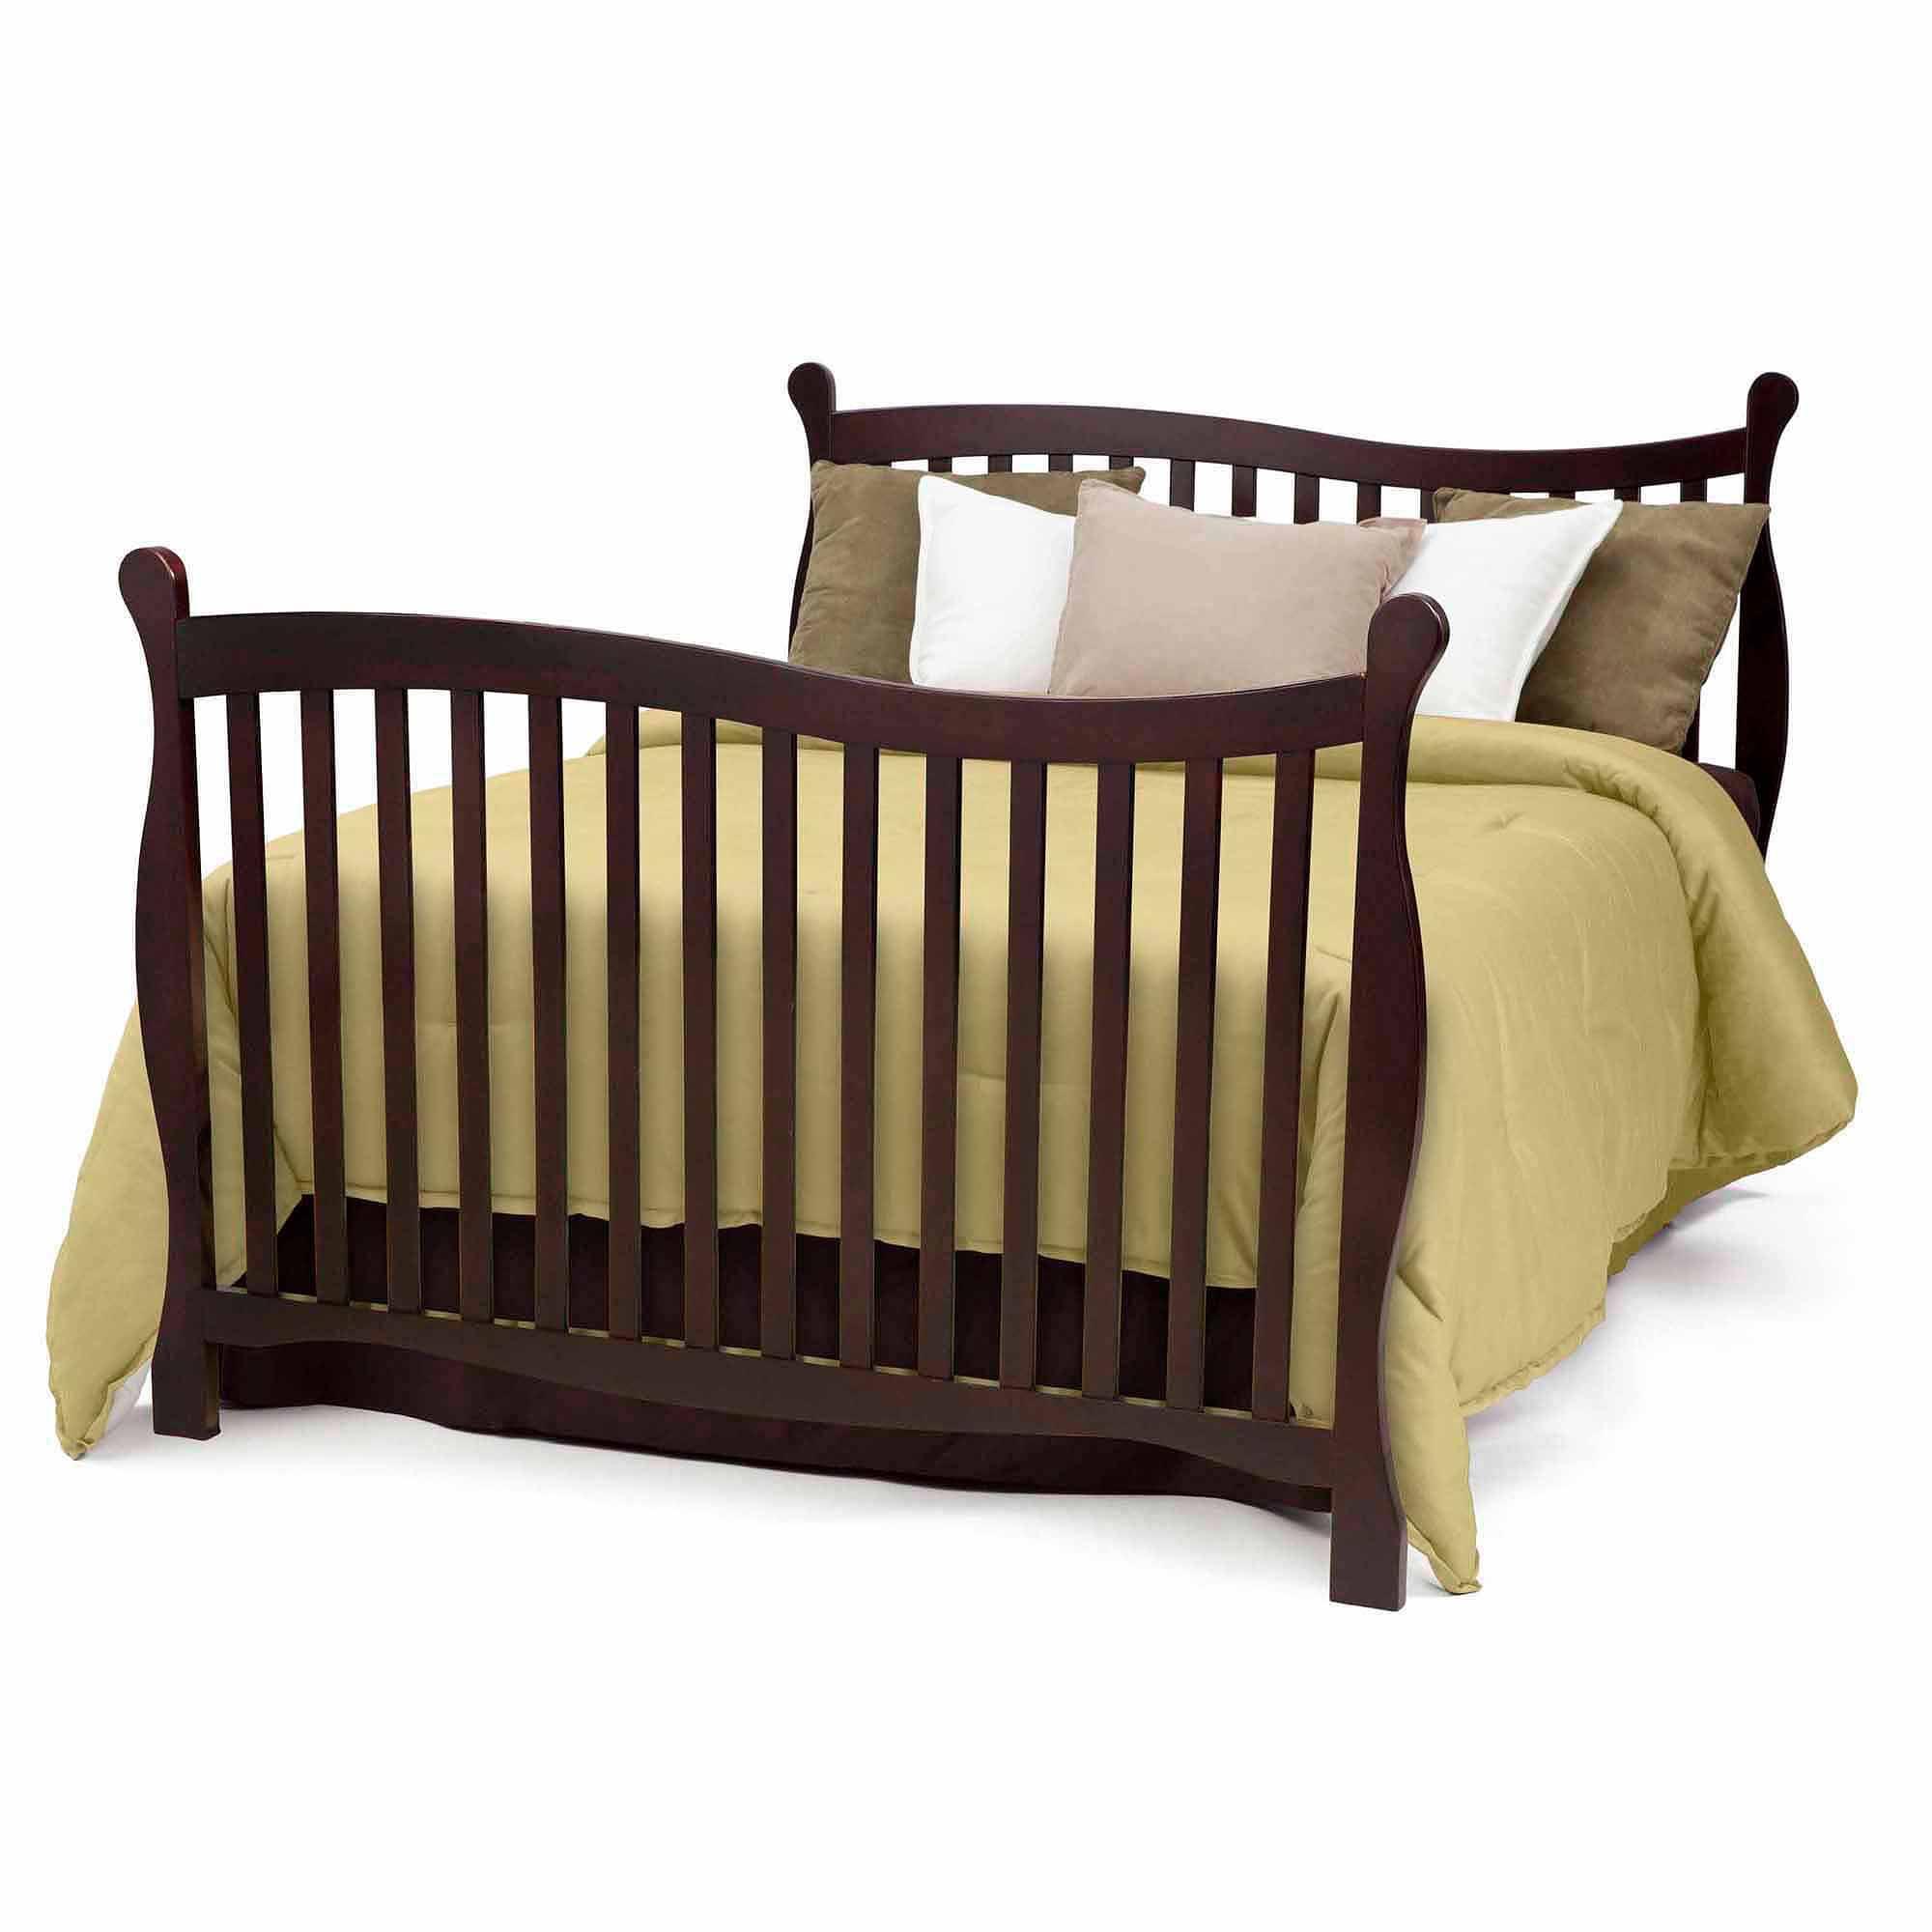 Crib for sale at walmart - Delta Children Brookside 4 In 1 Convertible Crib Dark Chocolate Walmart Com